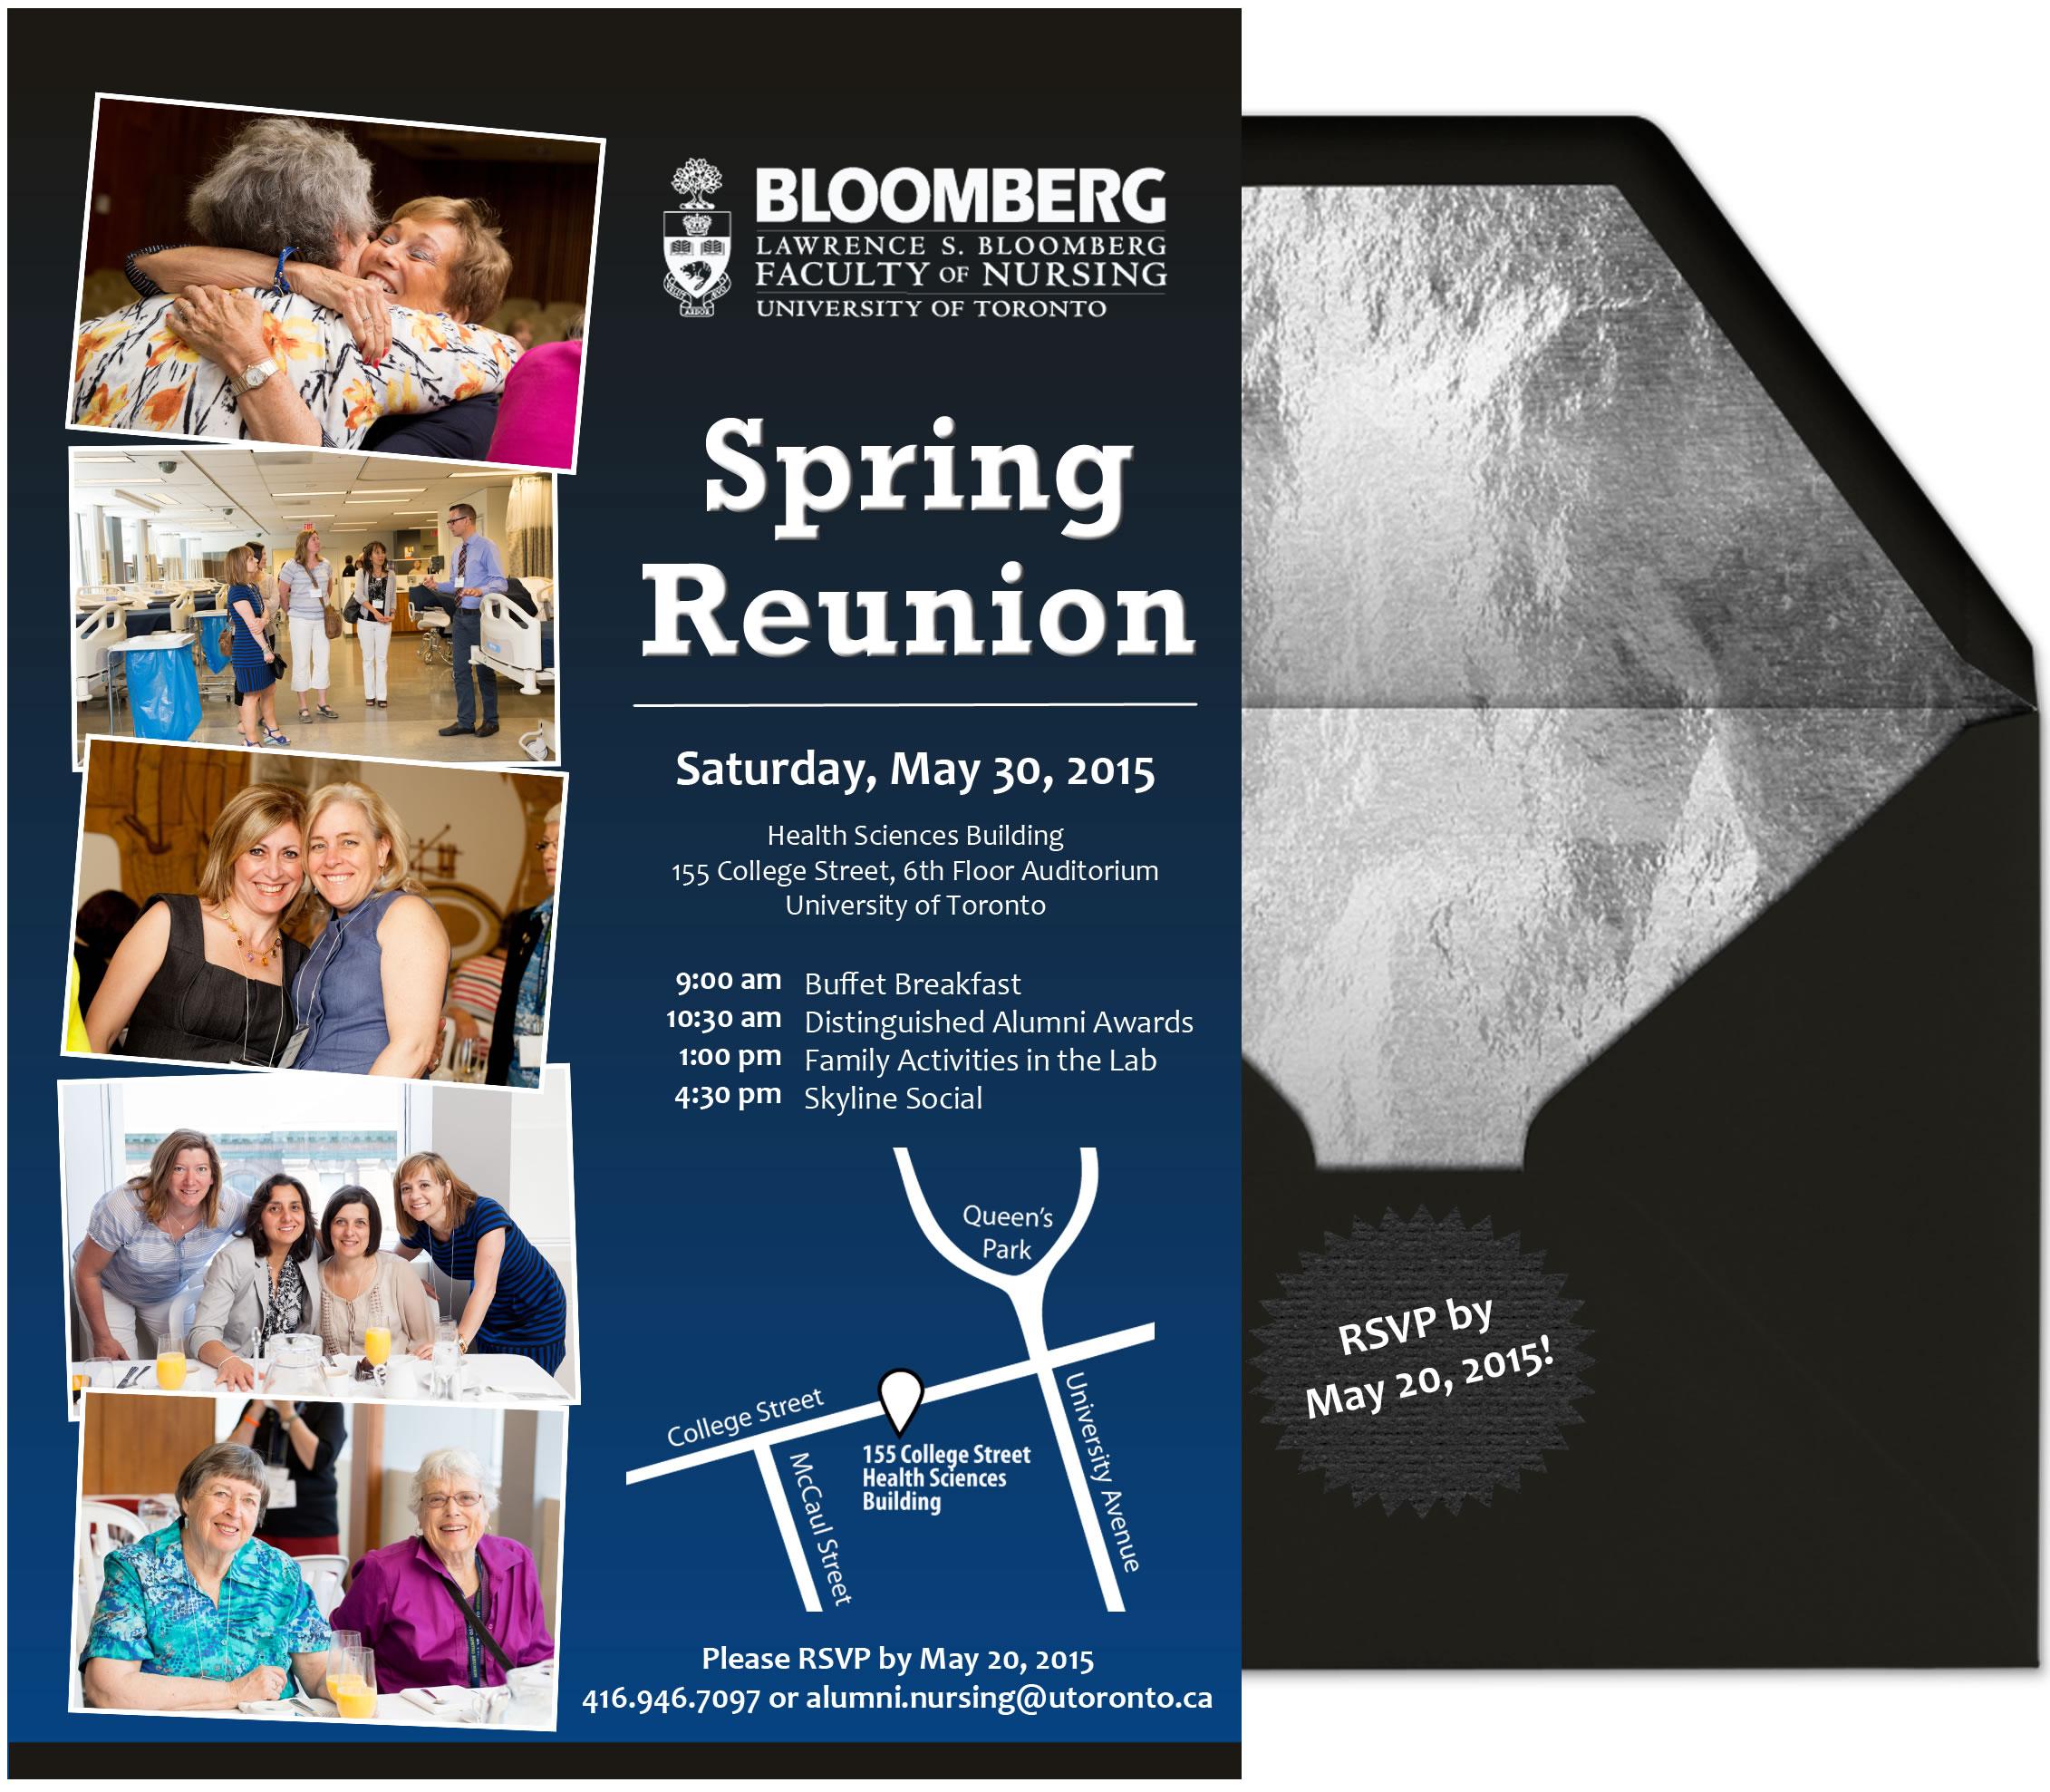 Spring Reunion_Skyline Social